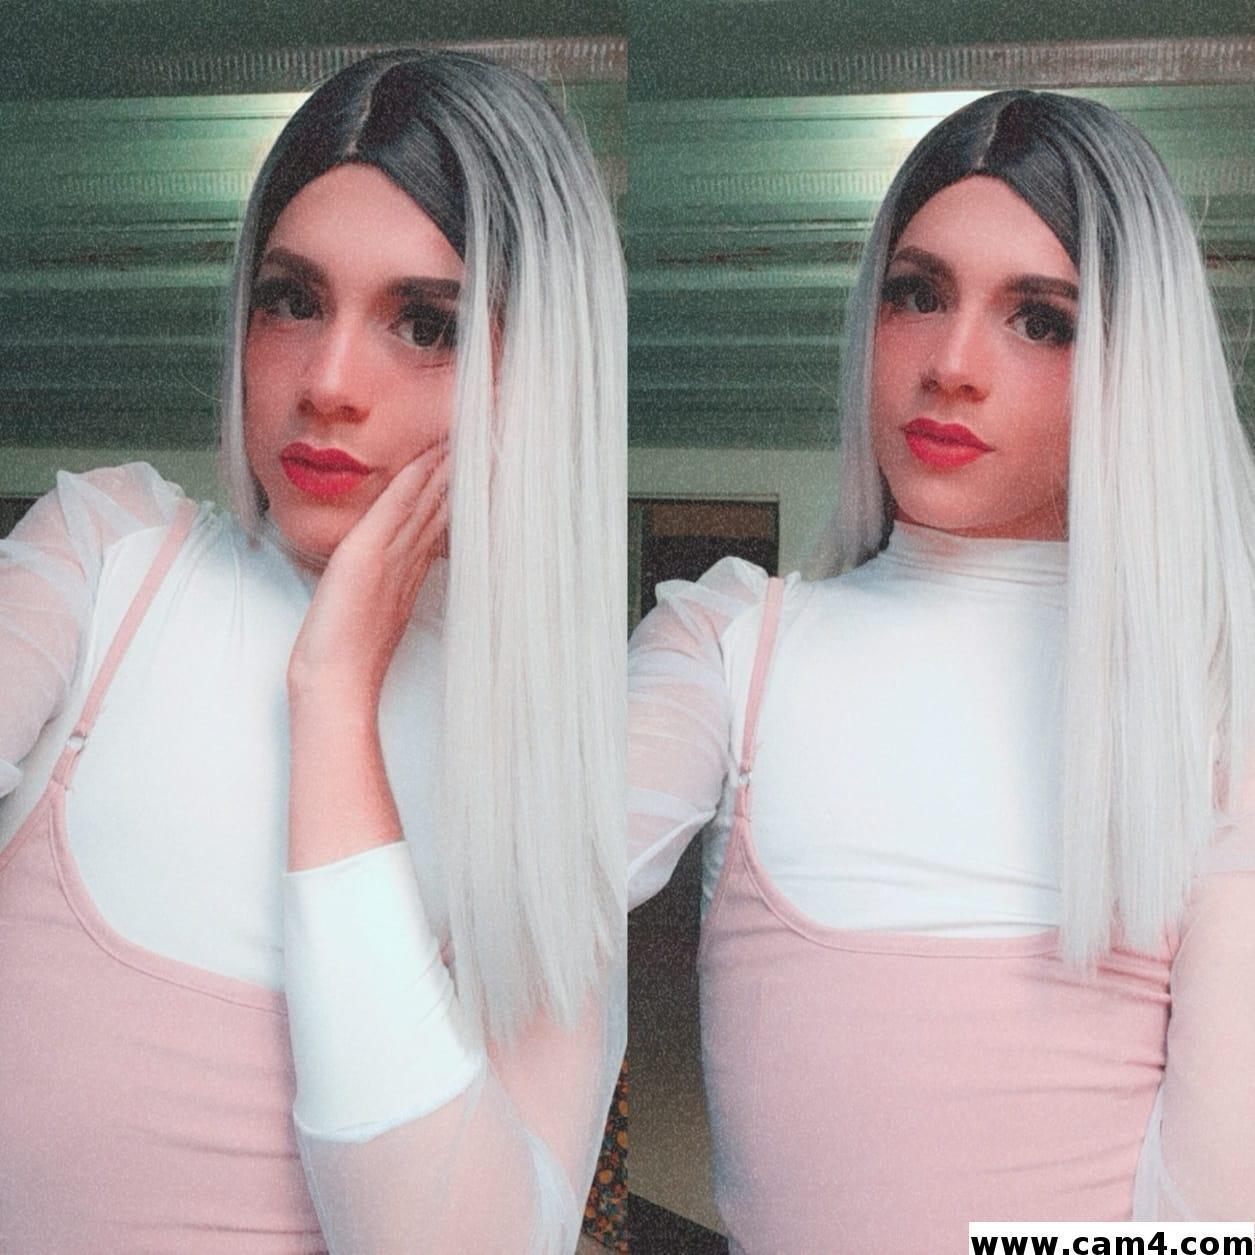 Arianna queen?s=253gr1w9vmd5pkqeutfrjlmazq7hyu3oqw3jpdumwxe=